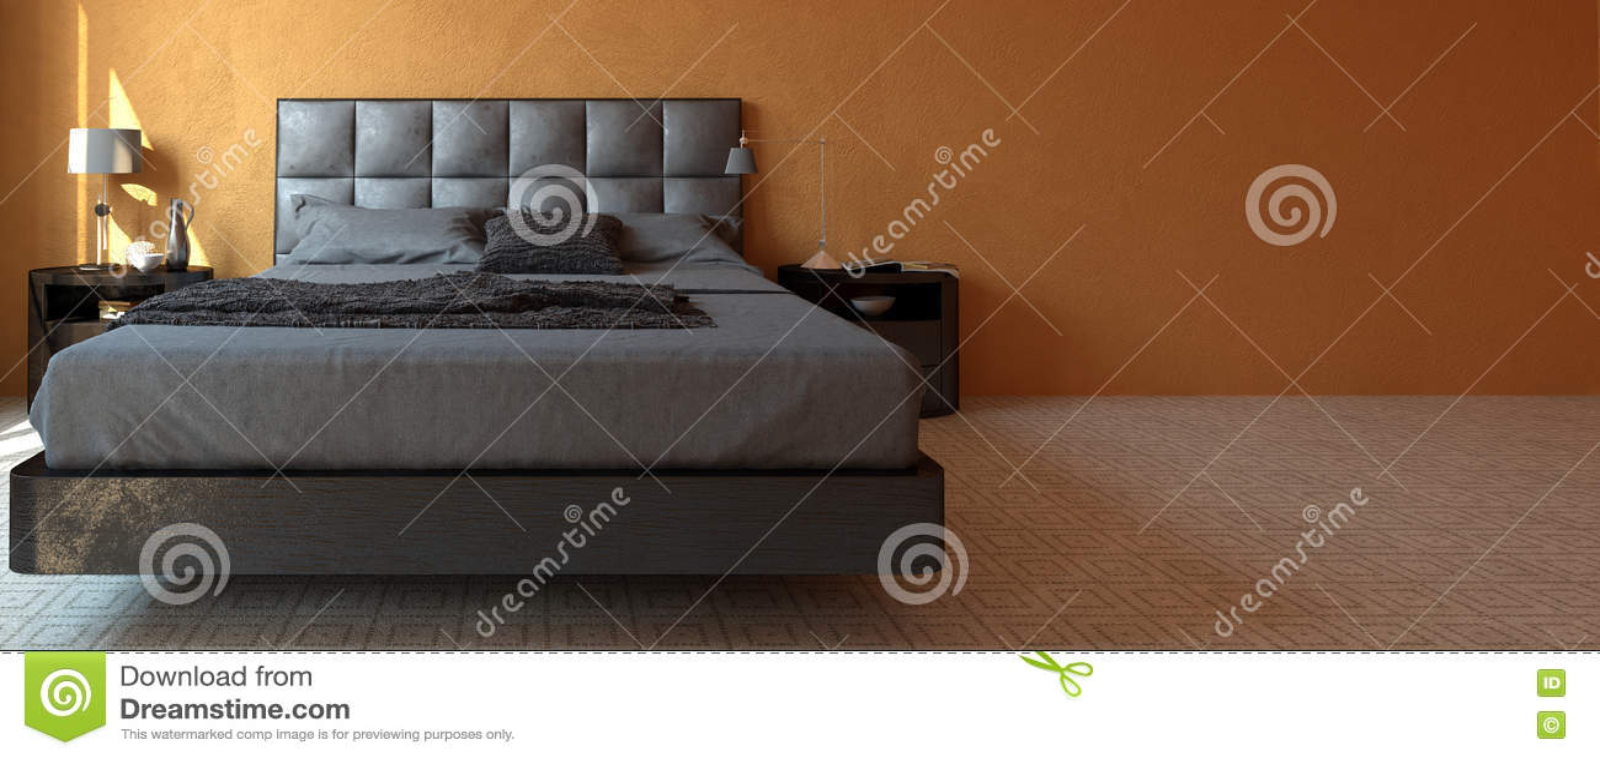 Modern Luxury Bedroom Furniture Modern Luxury Bedroom Interior Banner Stock Illustration Image